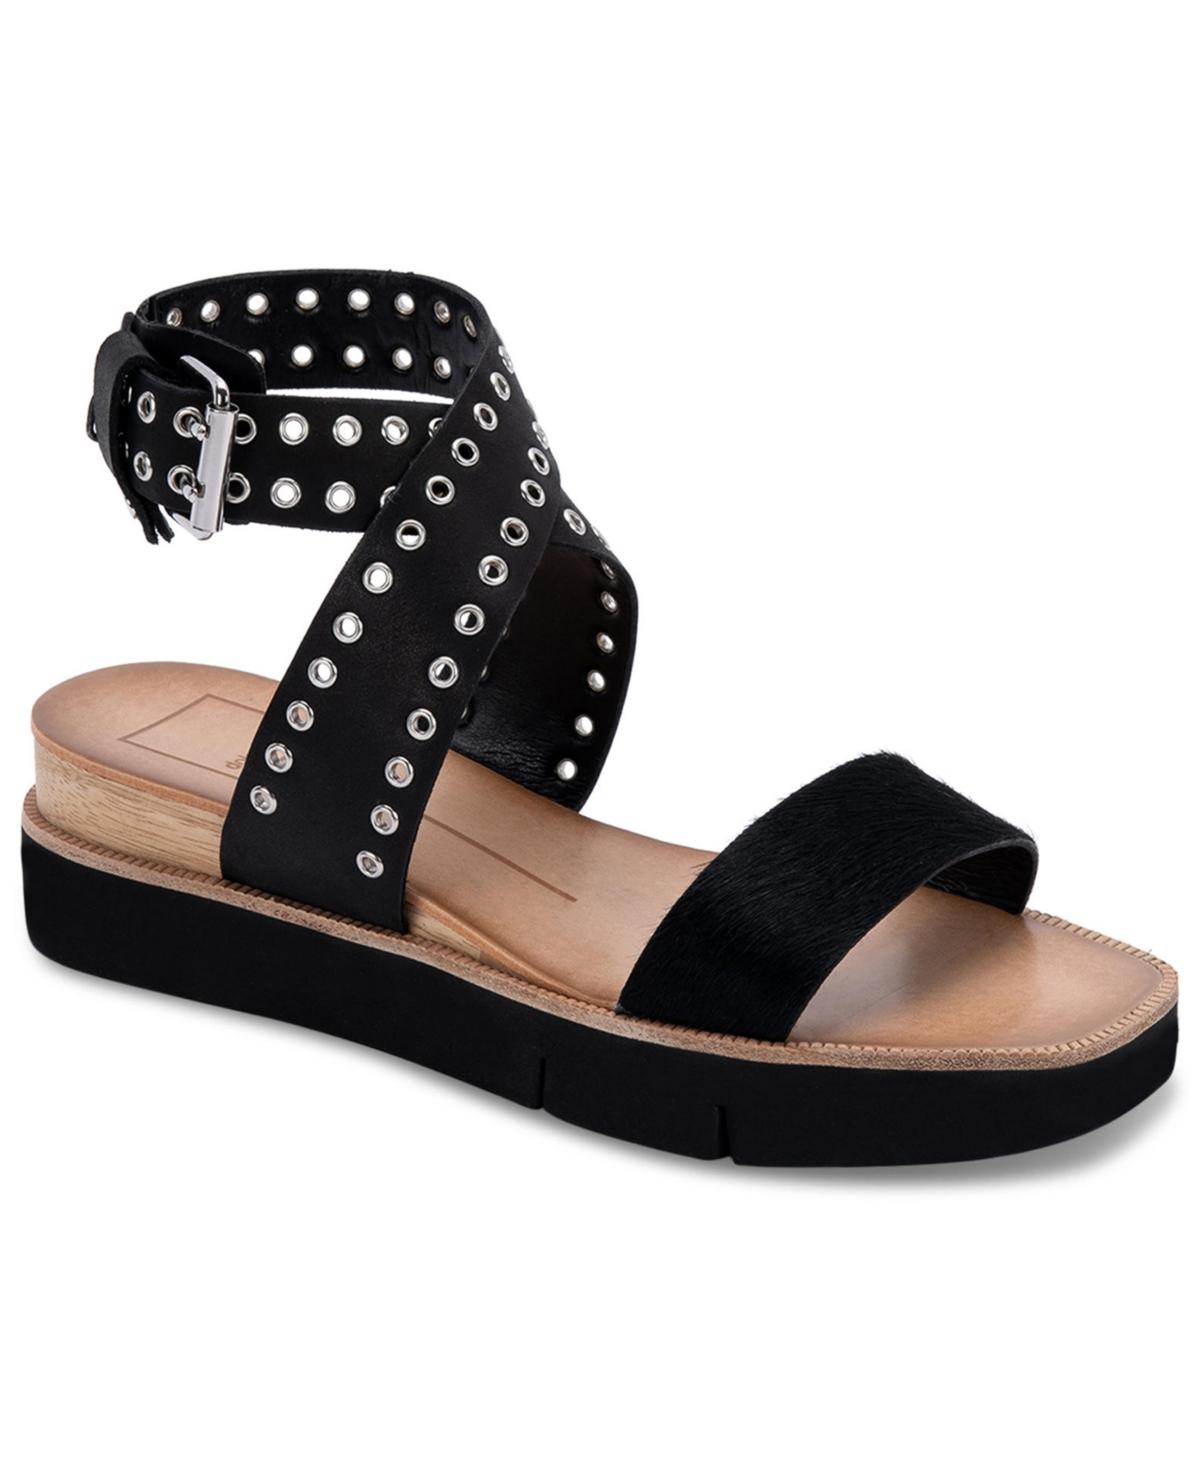 Dolce Vita Panko Grommet Wedge Sandals Women's Shoes